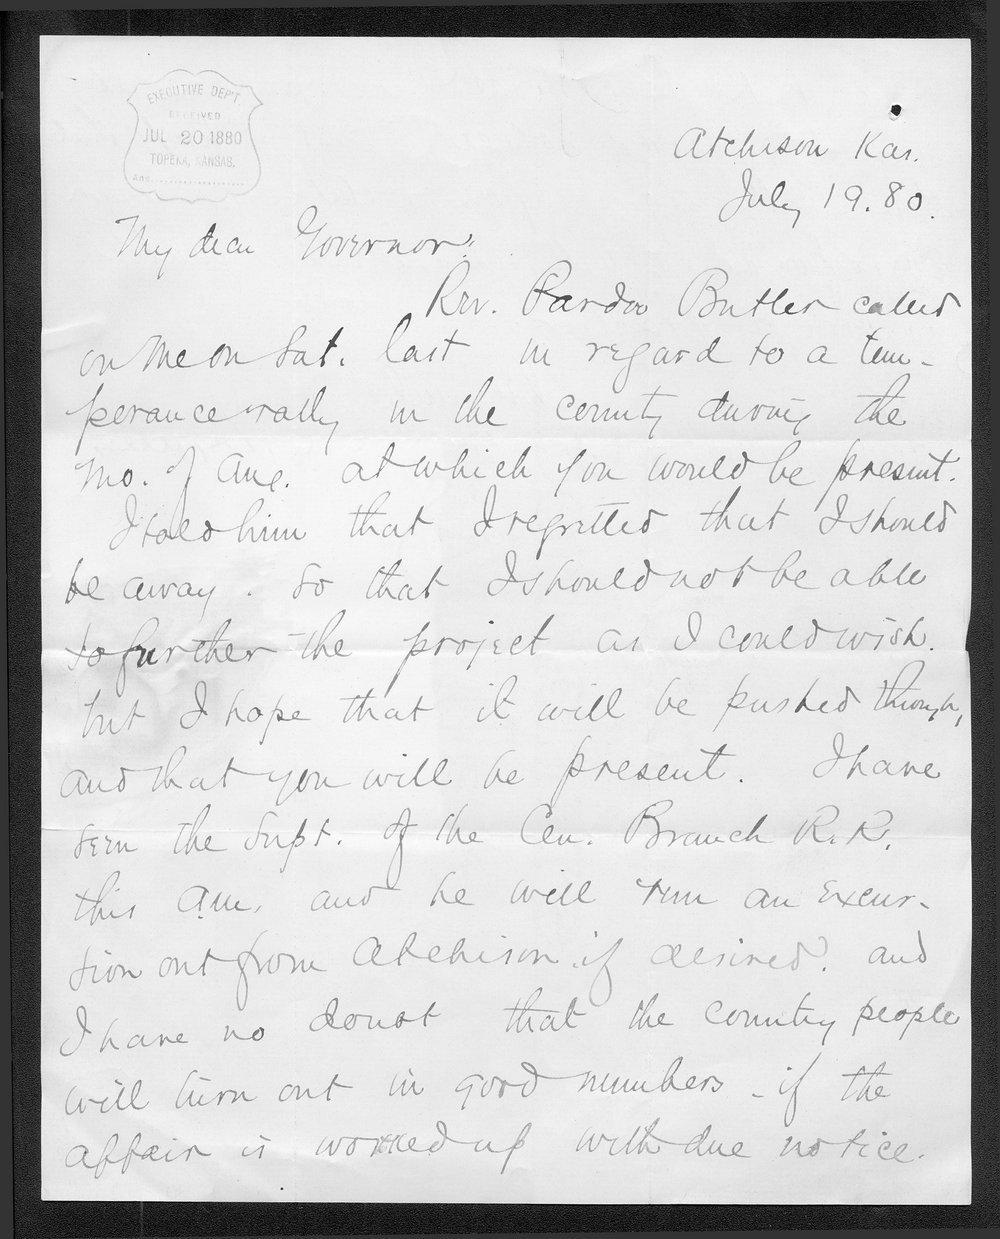 F. T. Ingalls to Governor John St. John - 1